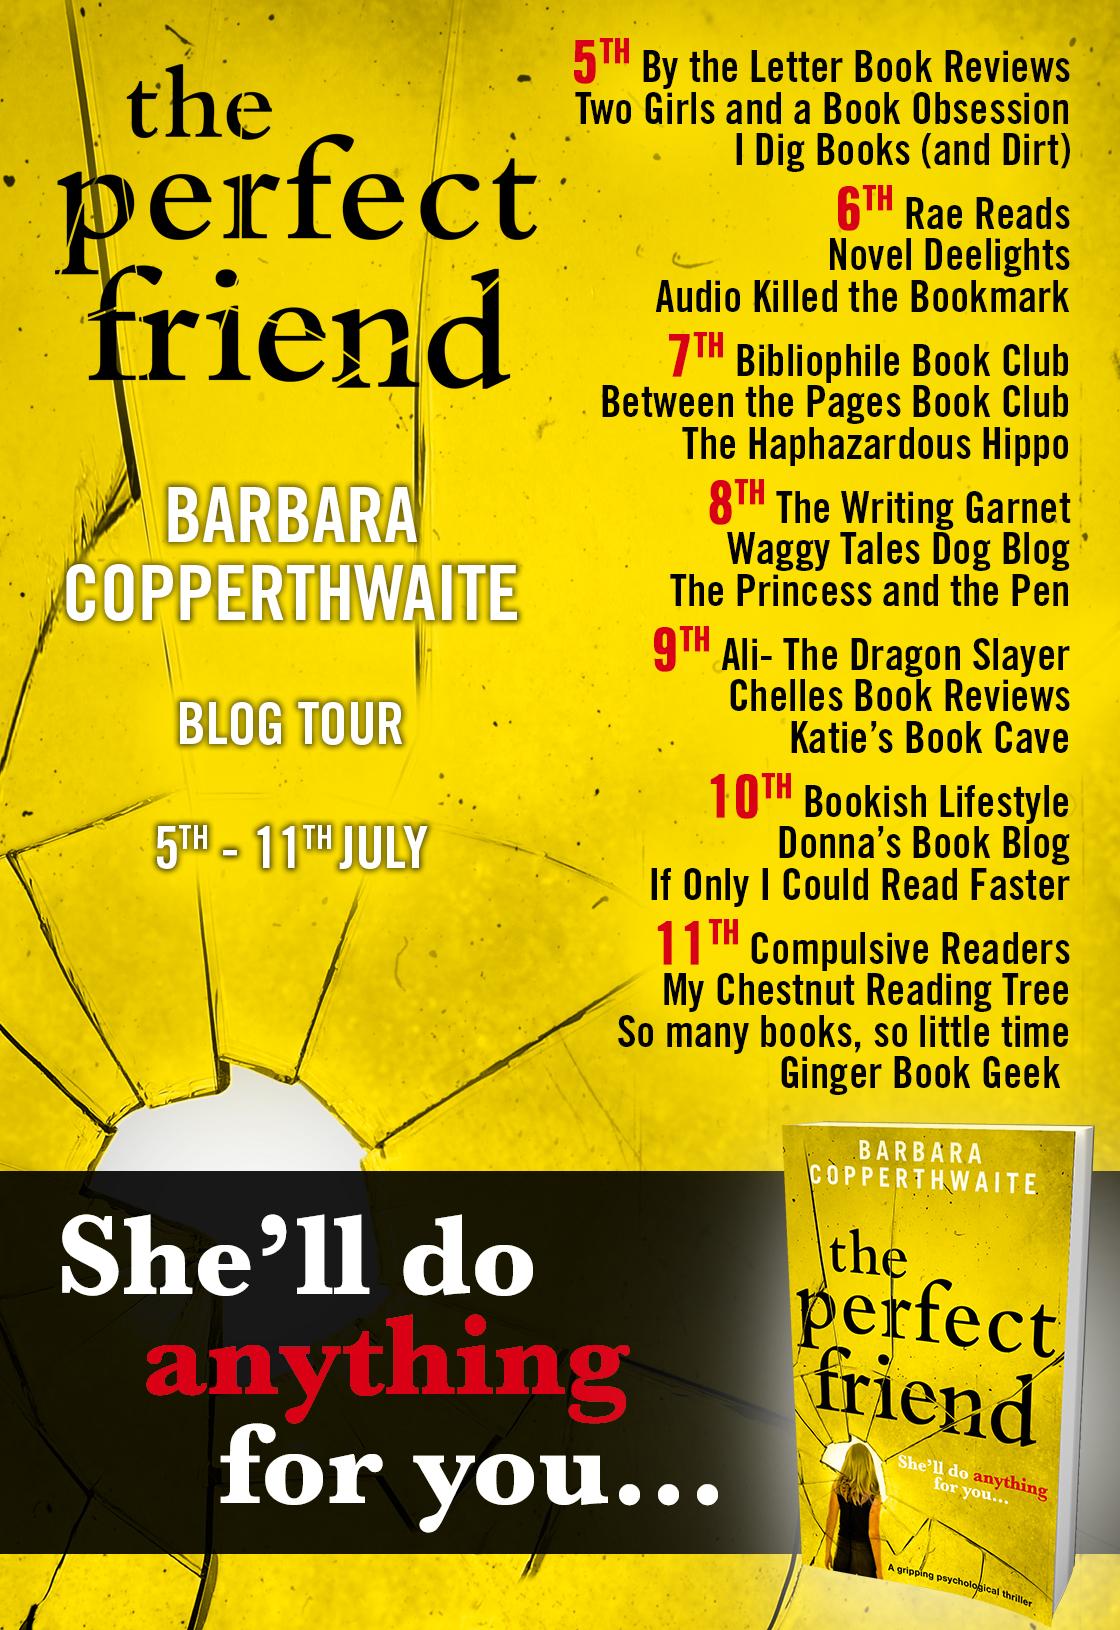 The Perfect Friend - Blog Tour.jpg